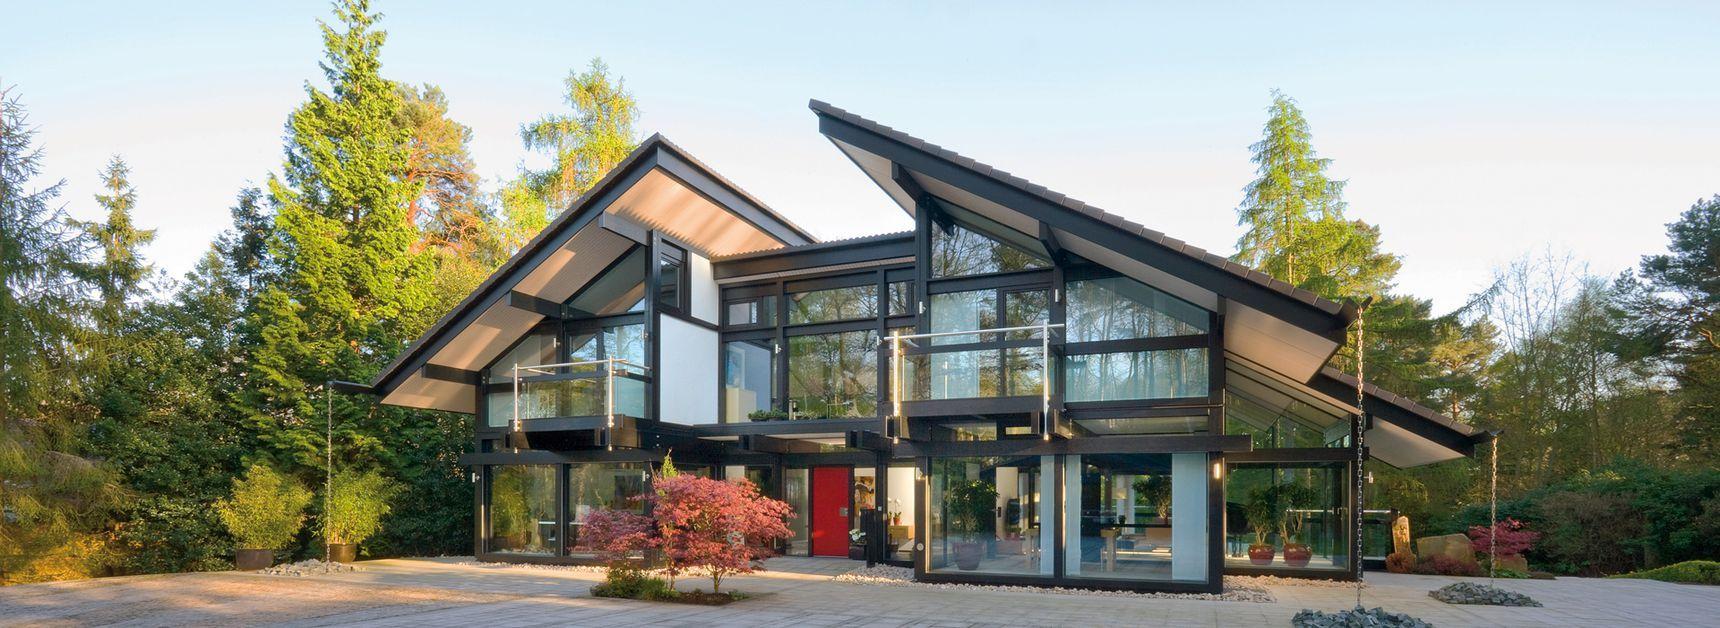 Grand designs huf haus amazing houses house design - German prefab homes grand designs ...